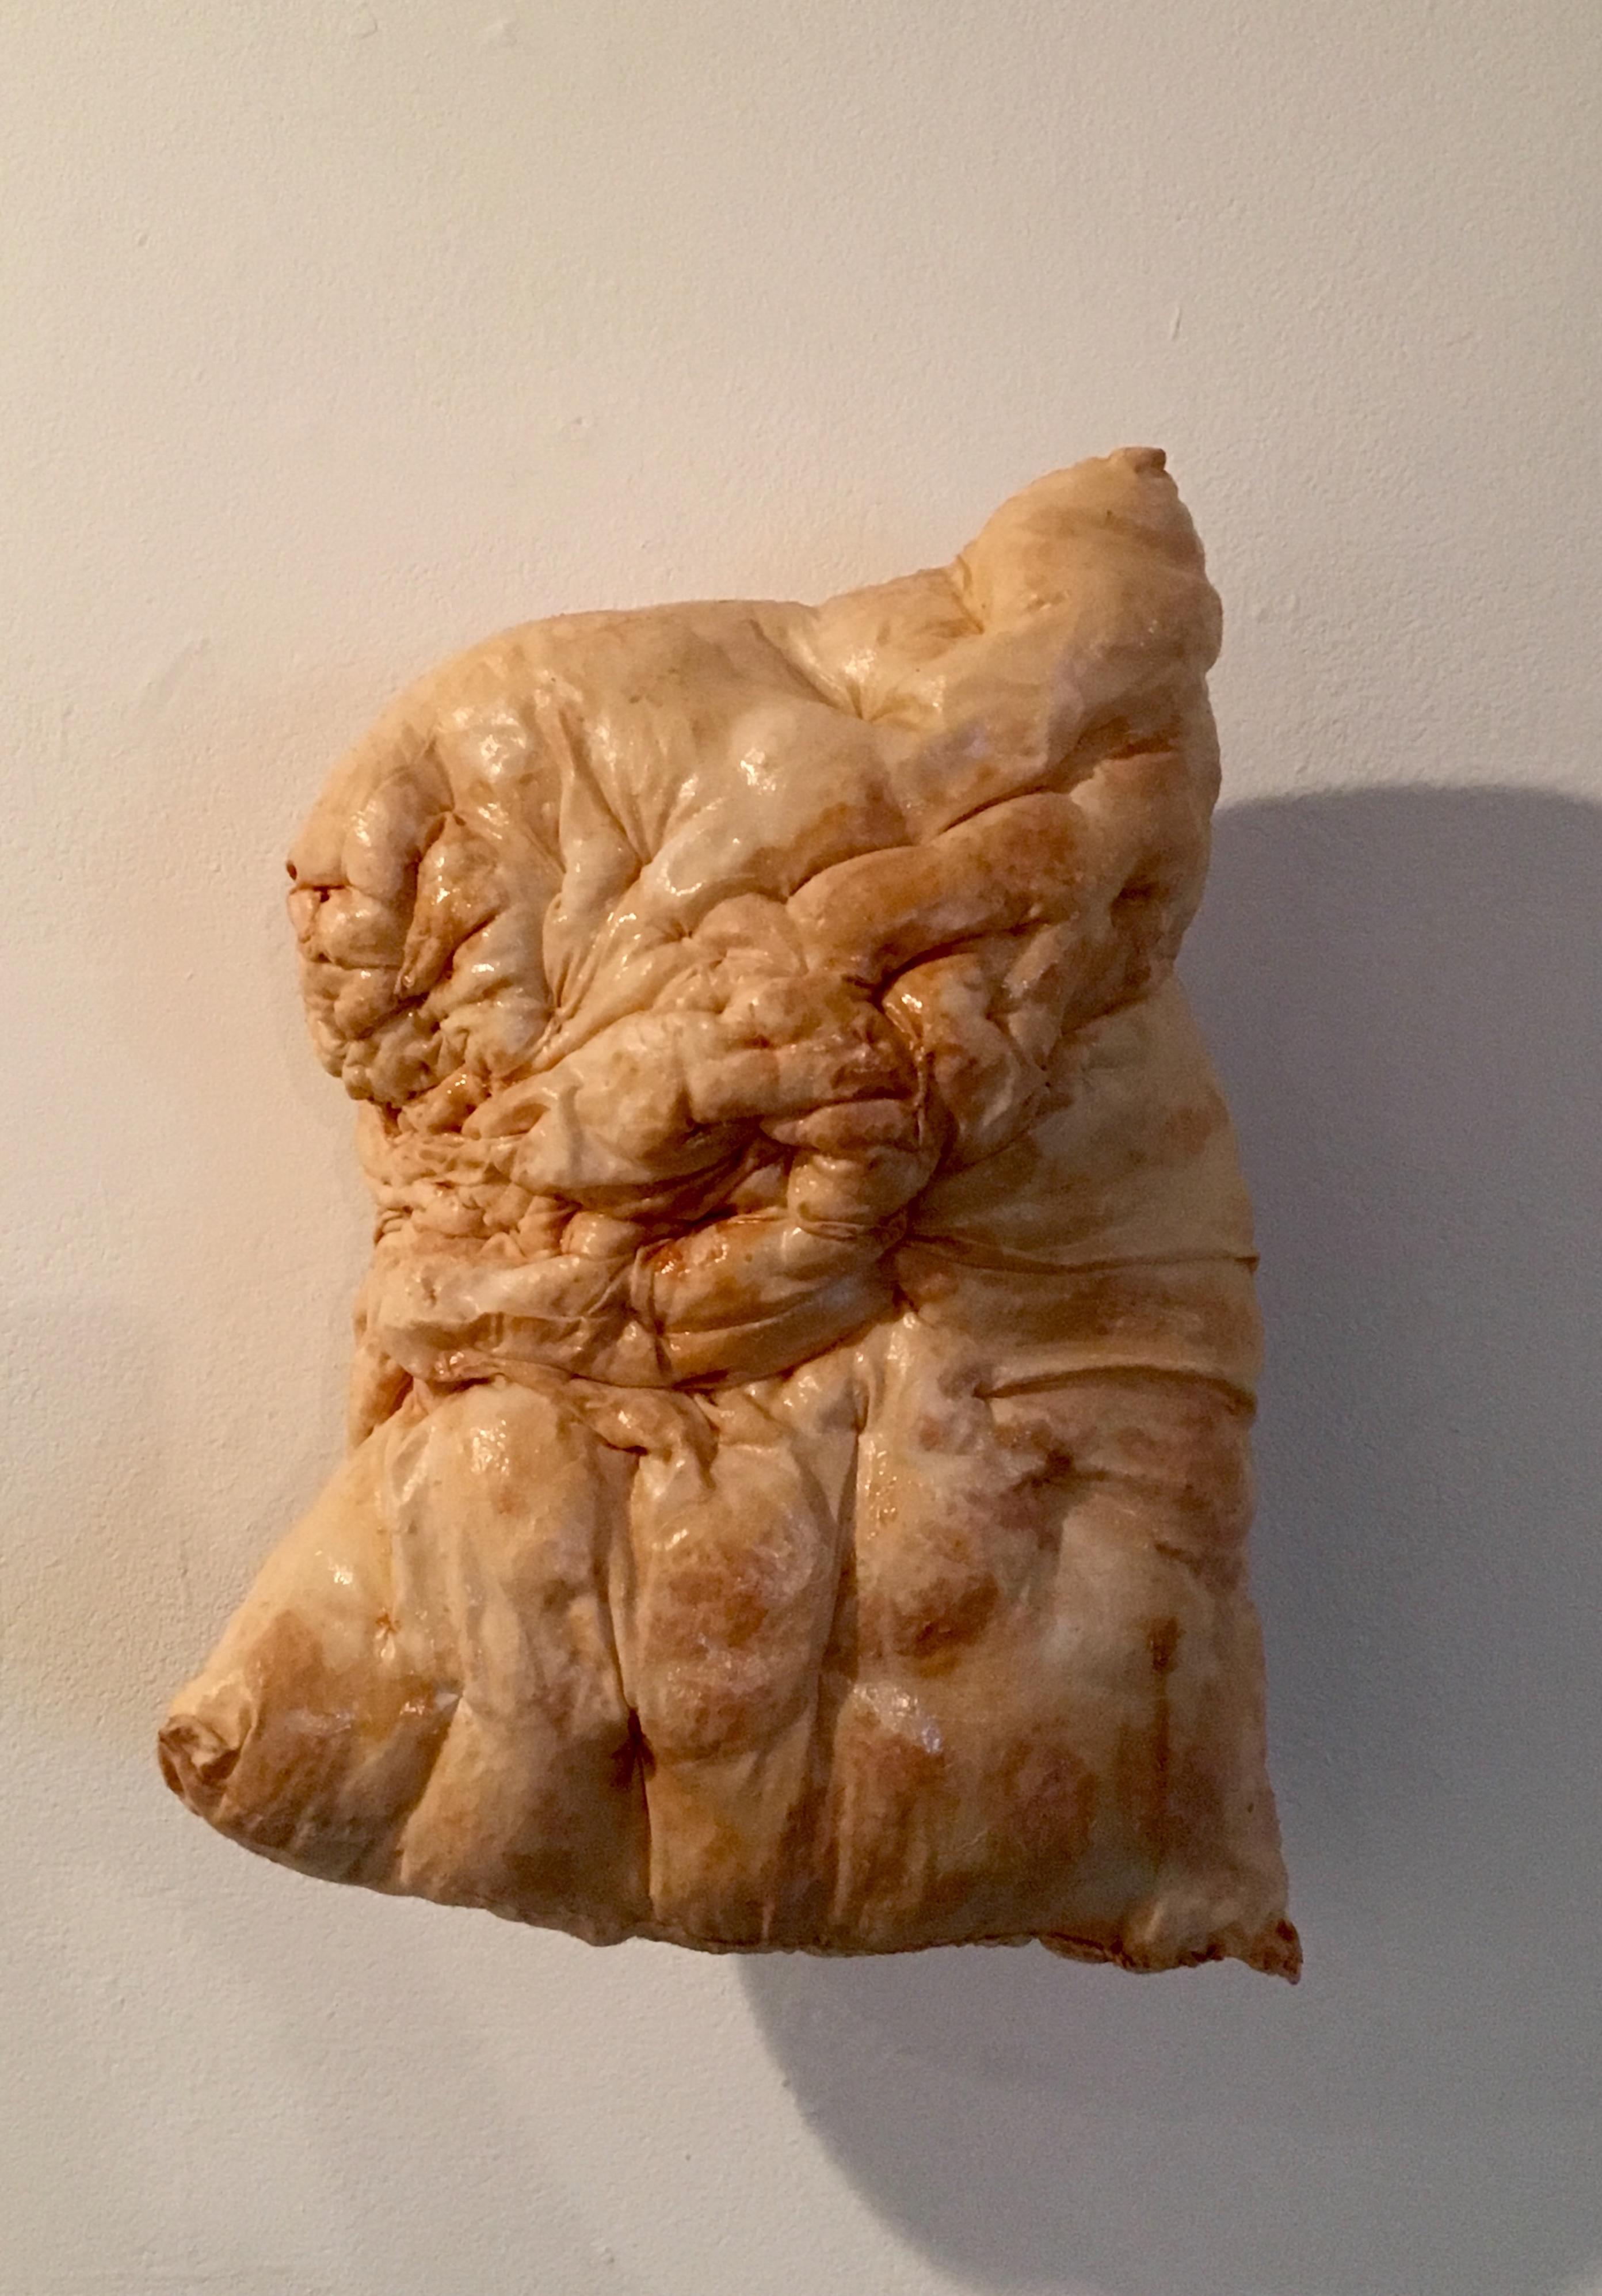 Jade Abner, Cradle Potato, 2012. Latex, chiffon, thread, poly-fil, velcro.